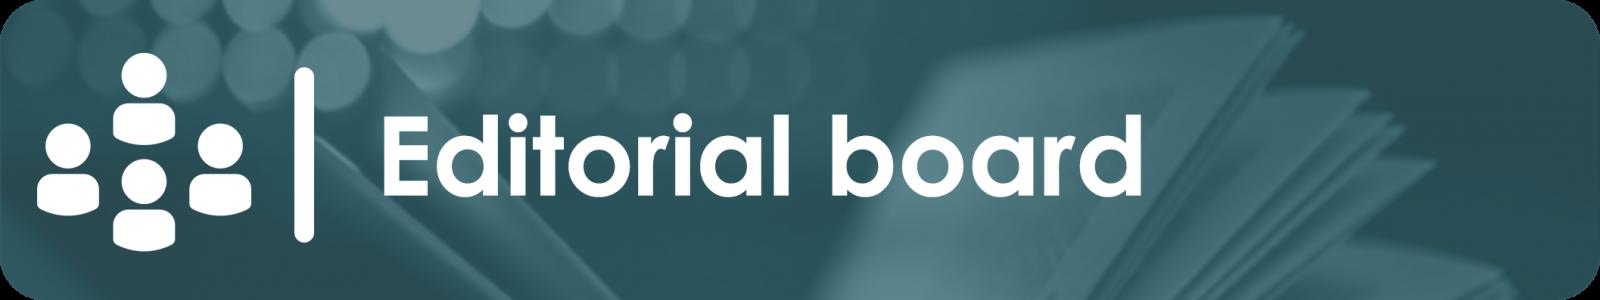 EditorialBoard.png